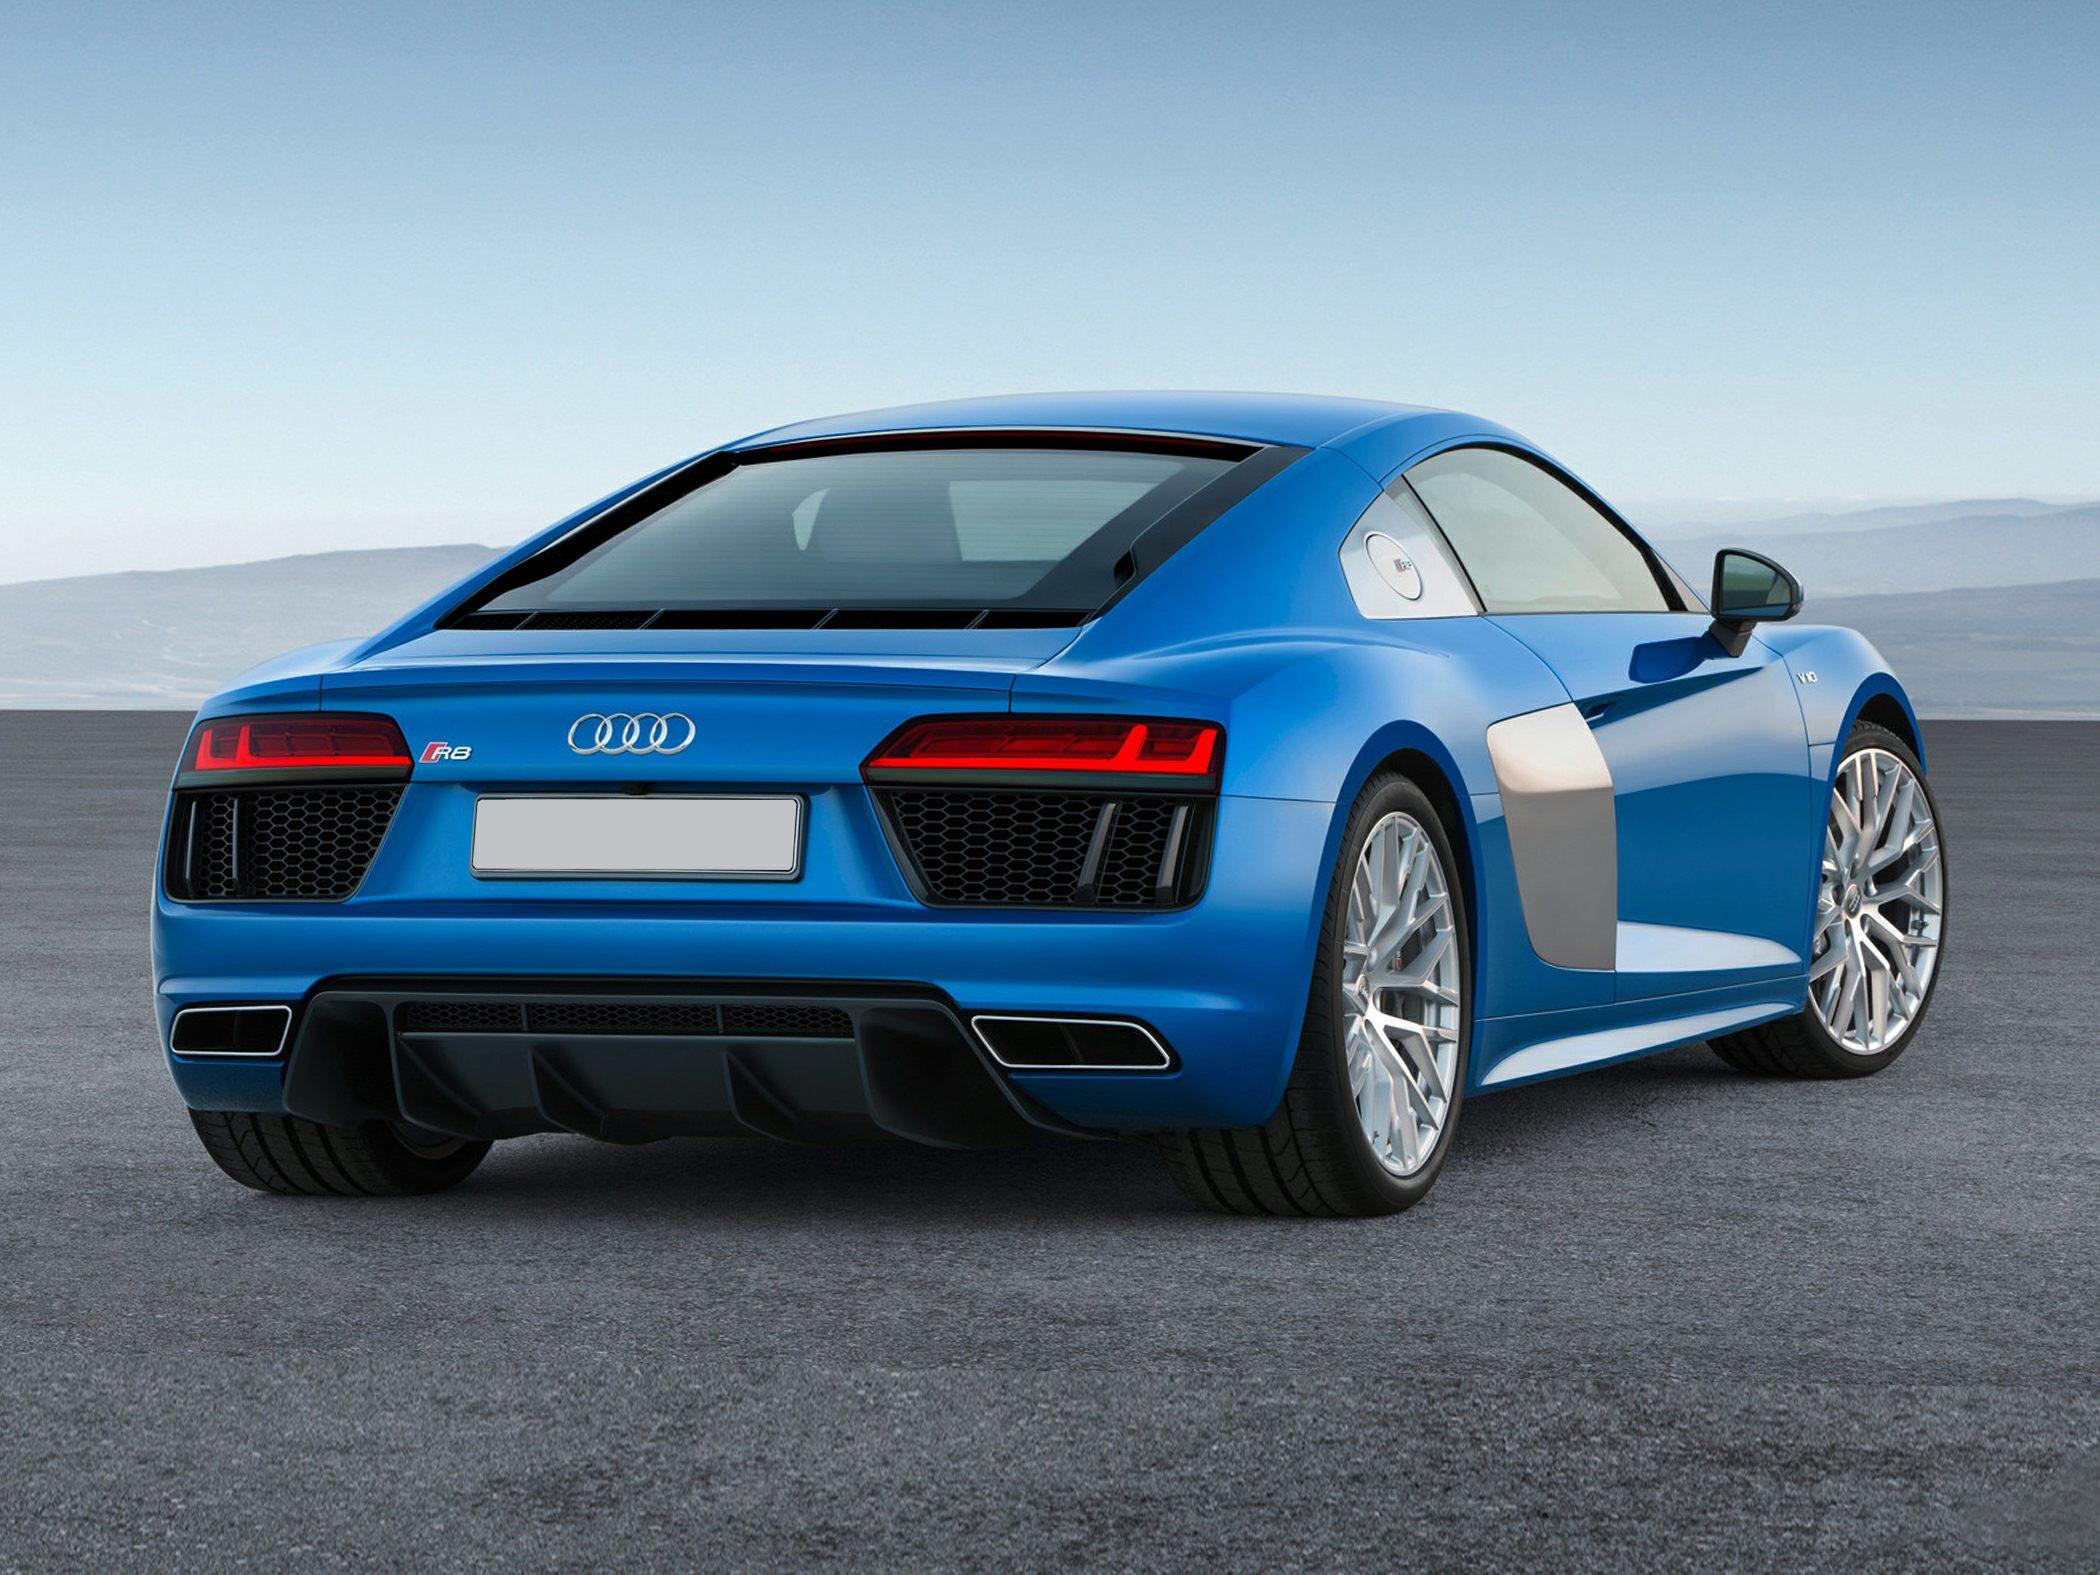 Audi R8 Rear Quarter